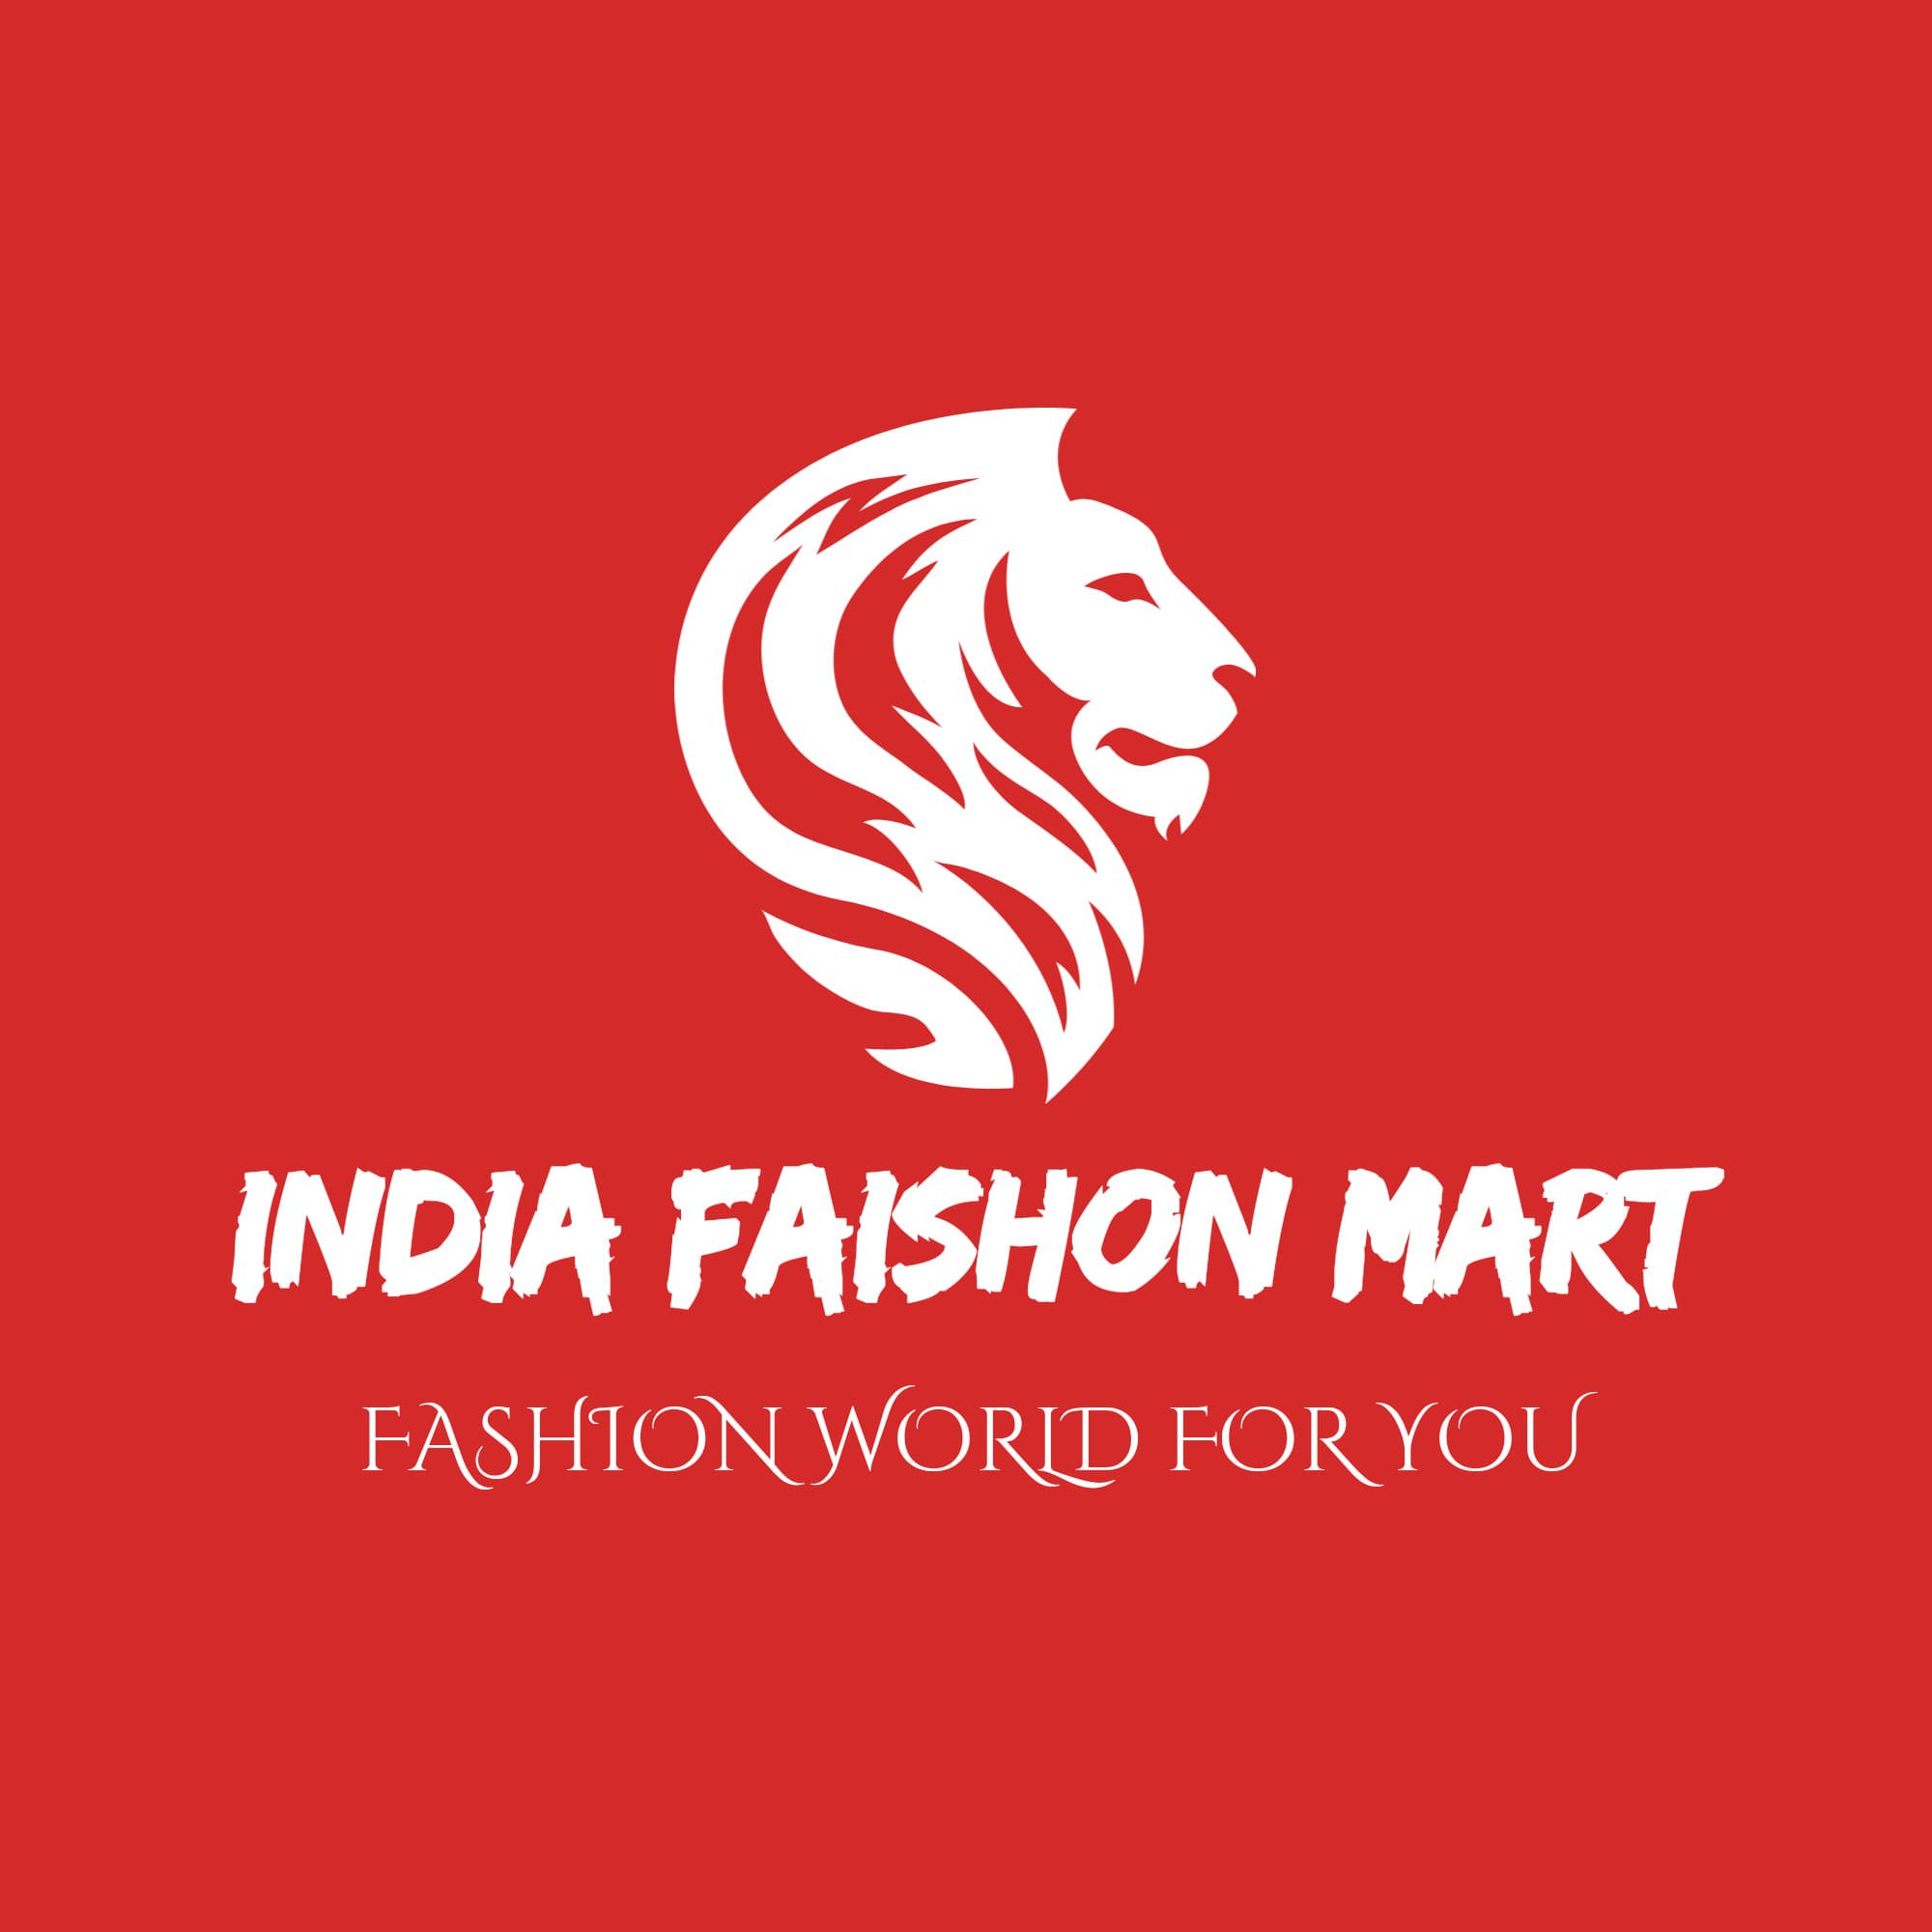 India Faishon Mart